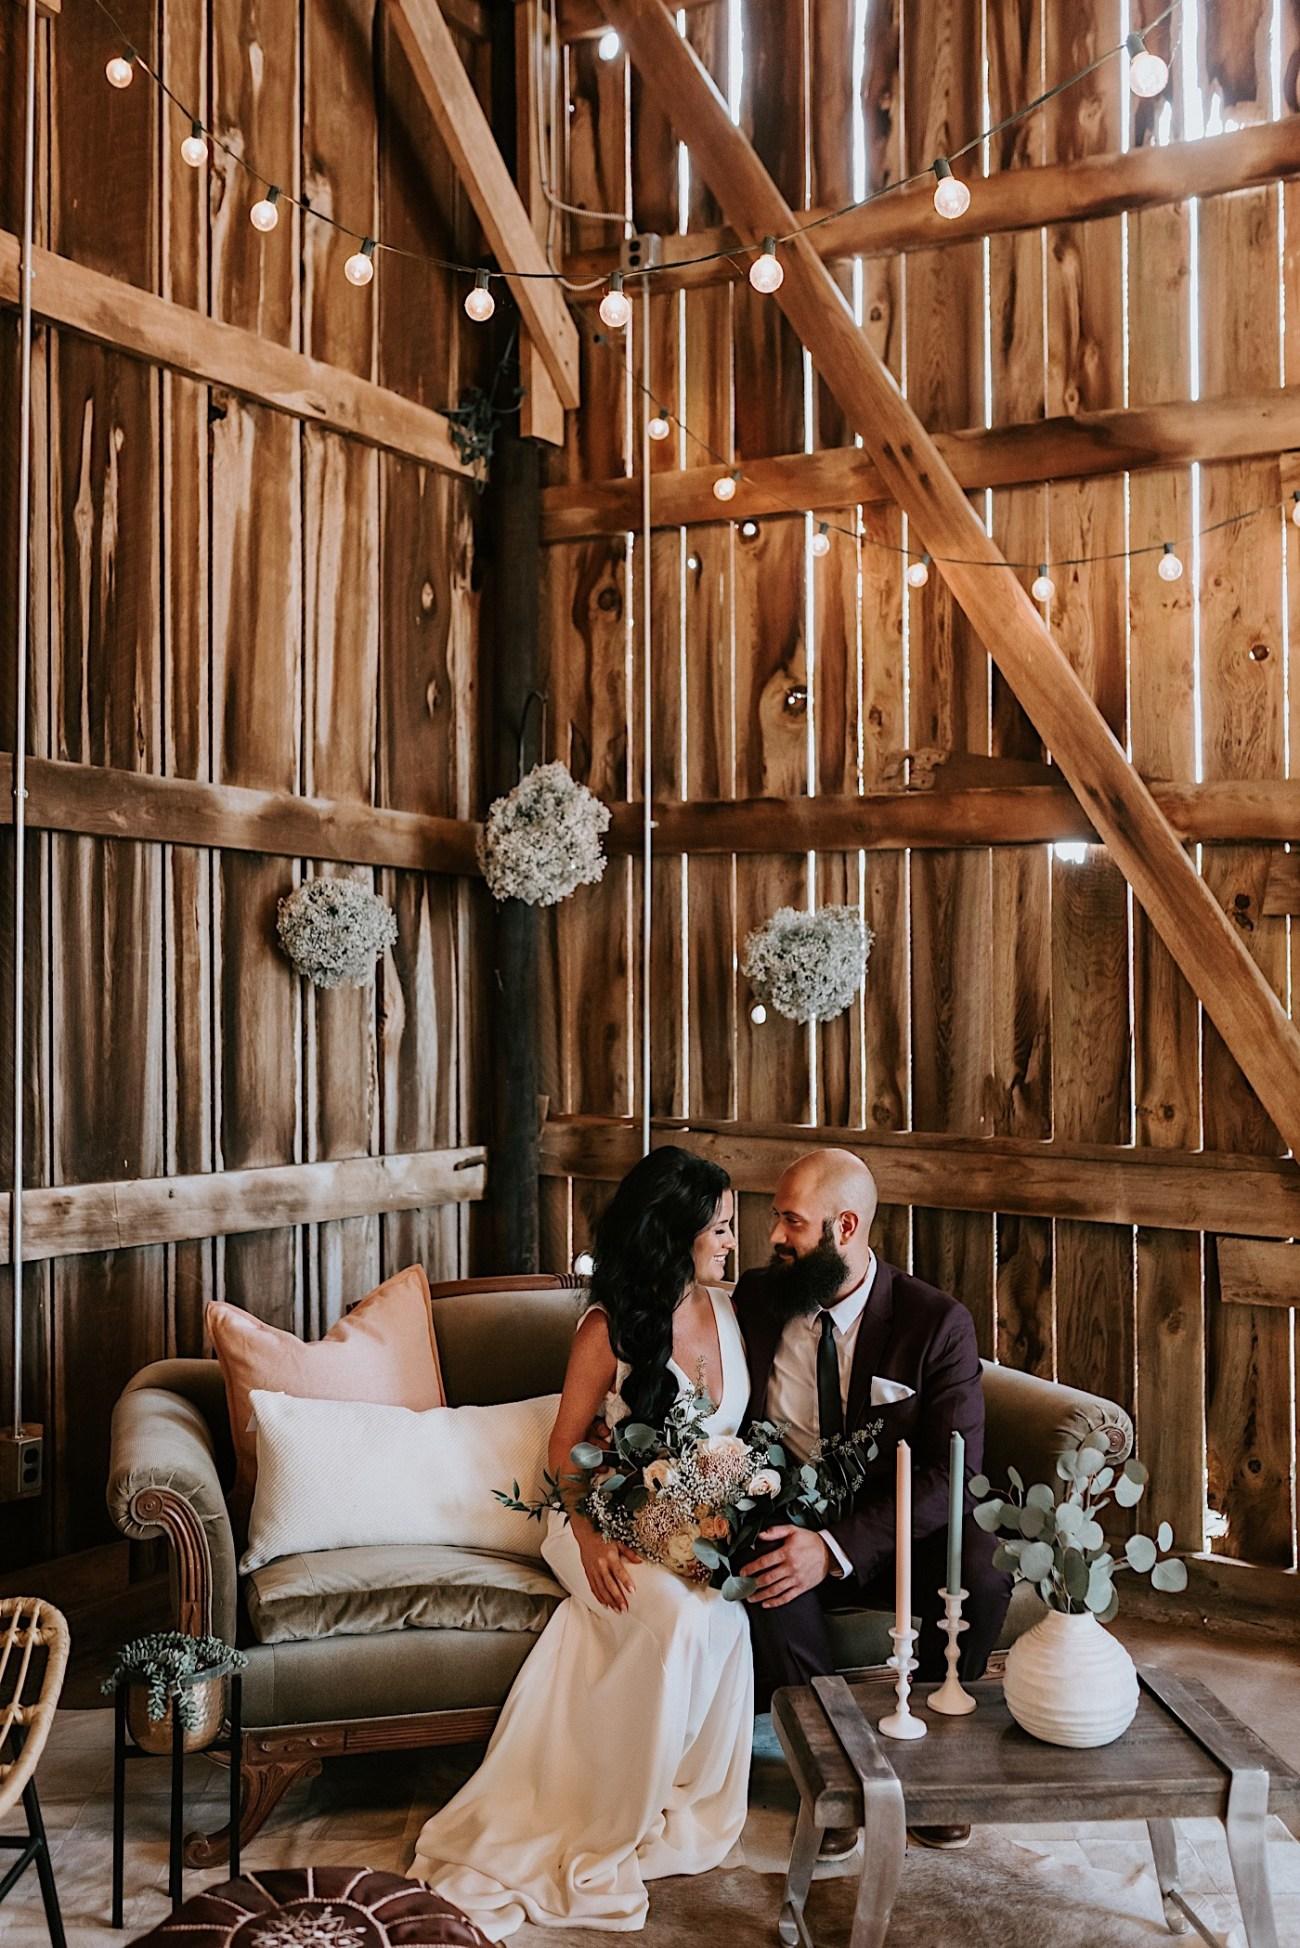 Gilbertsville Farmhouse Wedding Barn Inspiration Wedding Upstate New York Wedding Catskill Hudsonvalley Wedding 21